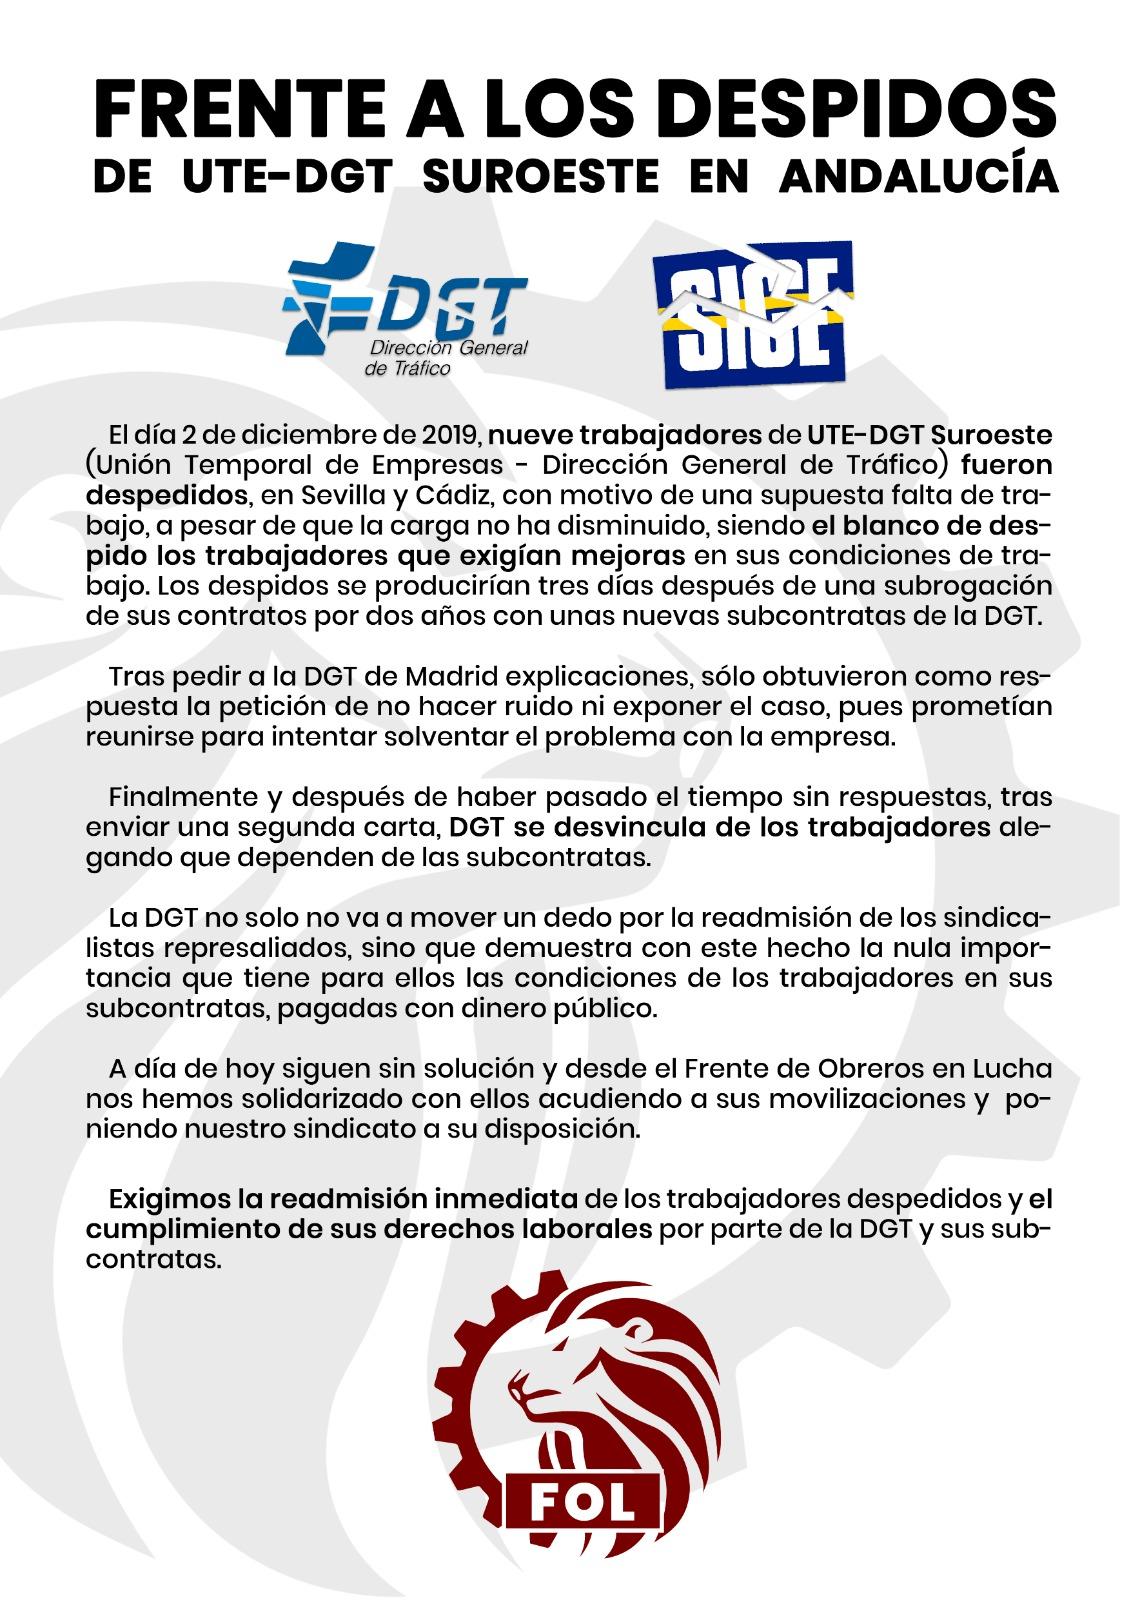 Frente A Los Despidos De UTE-DGT Suroeste En Andalucía